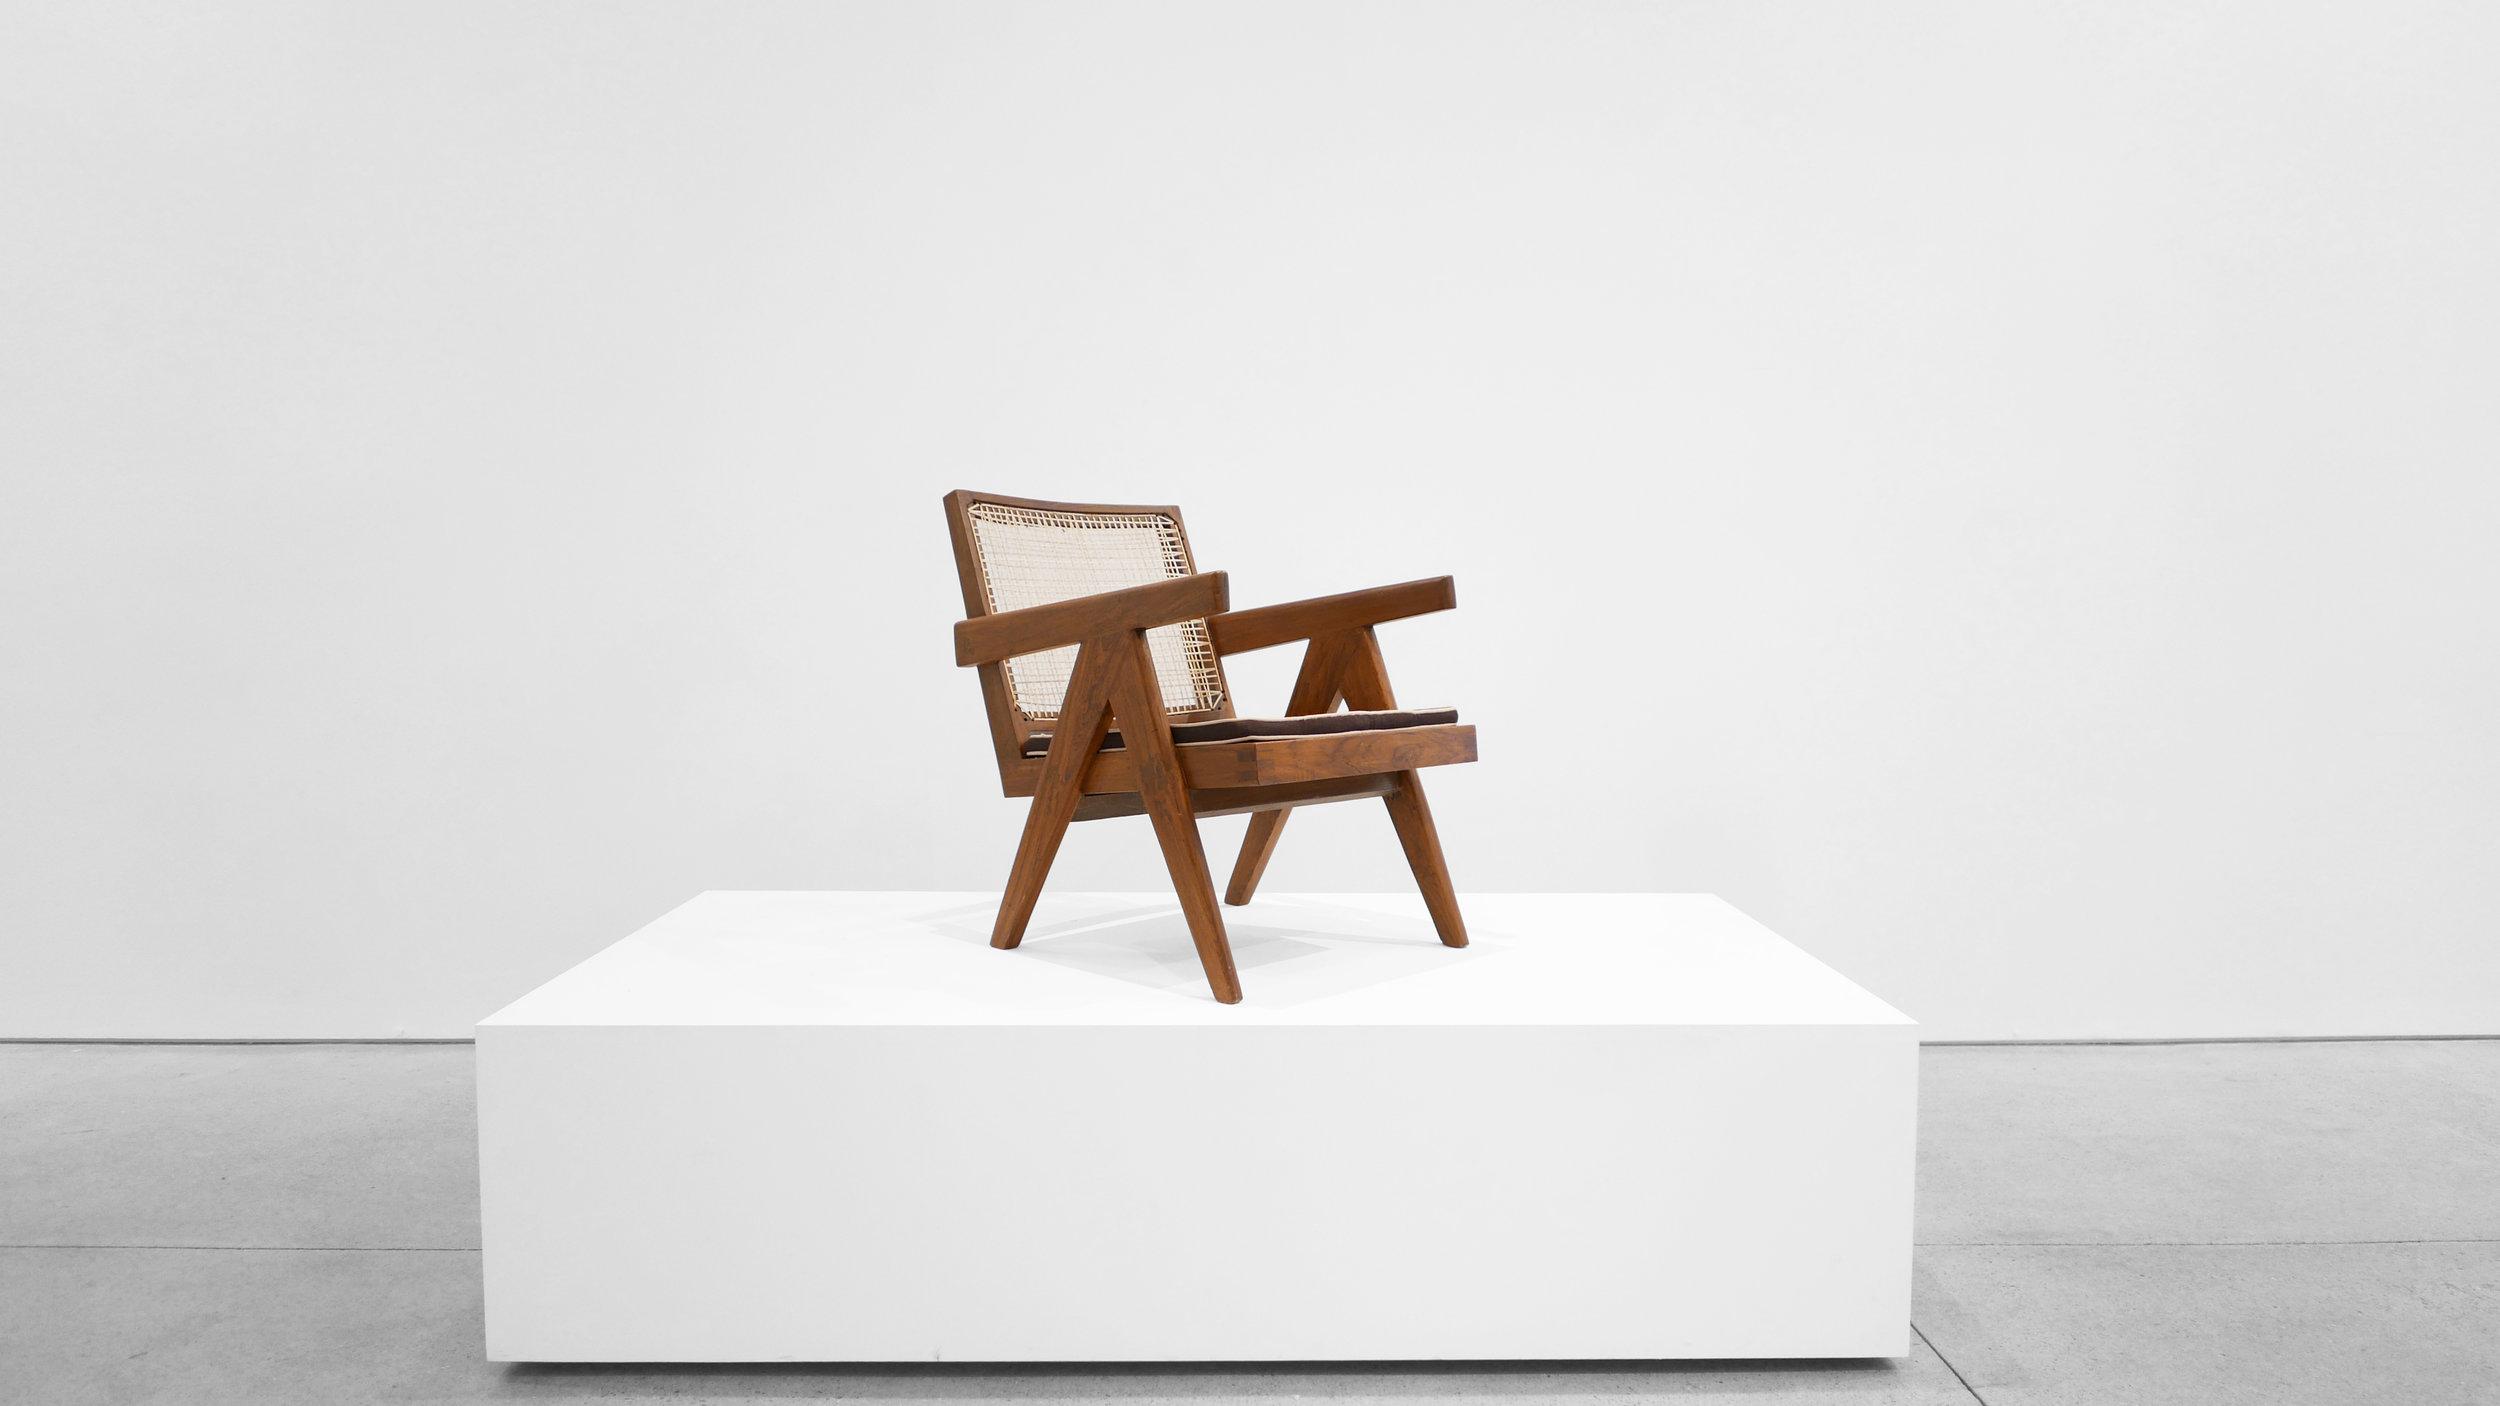 Pierre Jeanneret, Low lounge chair, model PJ-SI-29-A, c. 1955, teak, cane, 24.5H x 20.5W x 29.5D inches_1.jpg